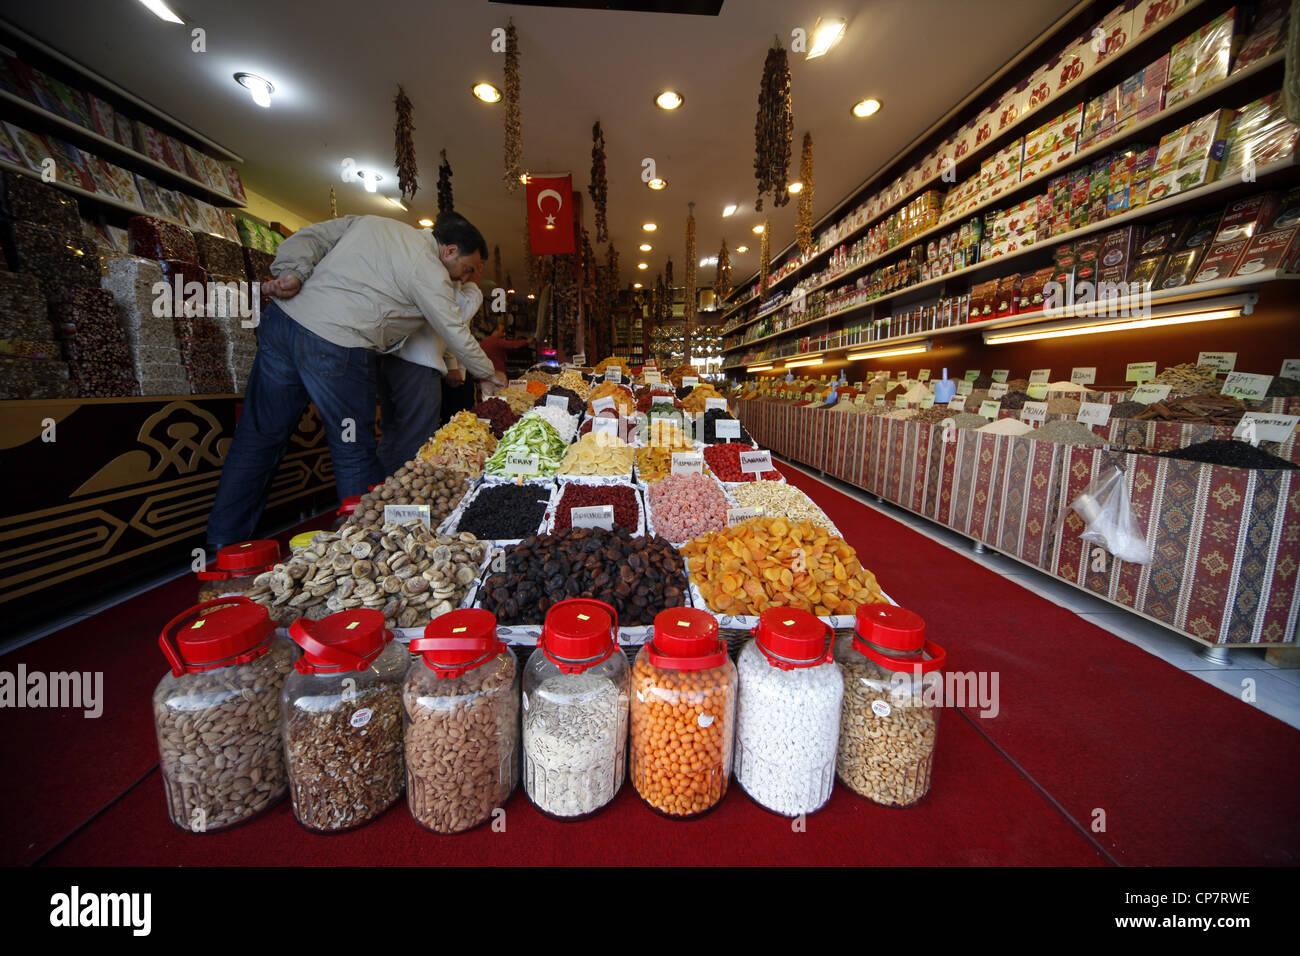 SWEET & SPICE SHOP SIDE TURKEY 15 April 2012 - Stock Image